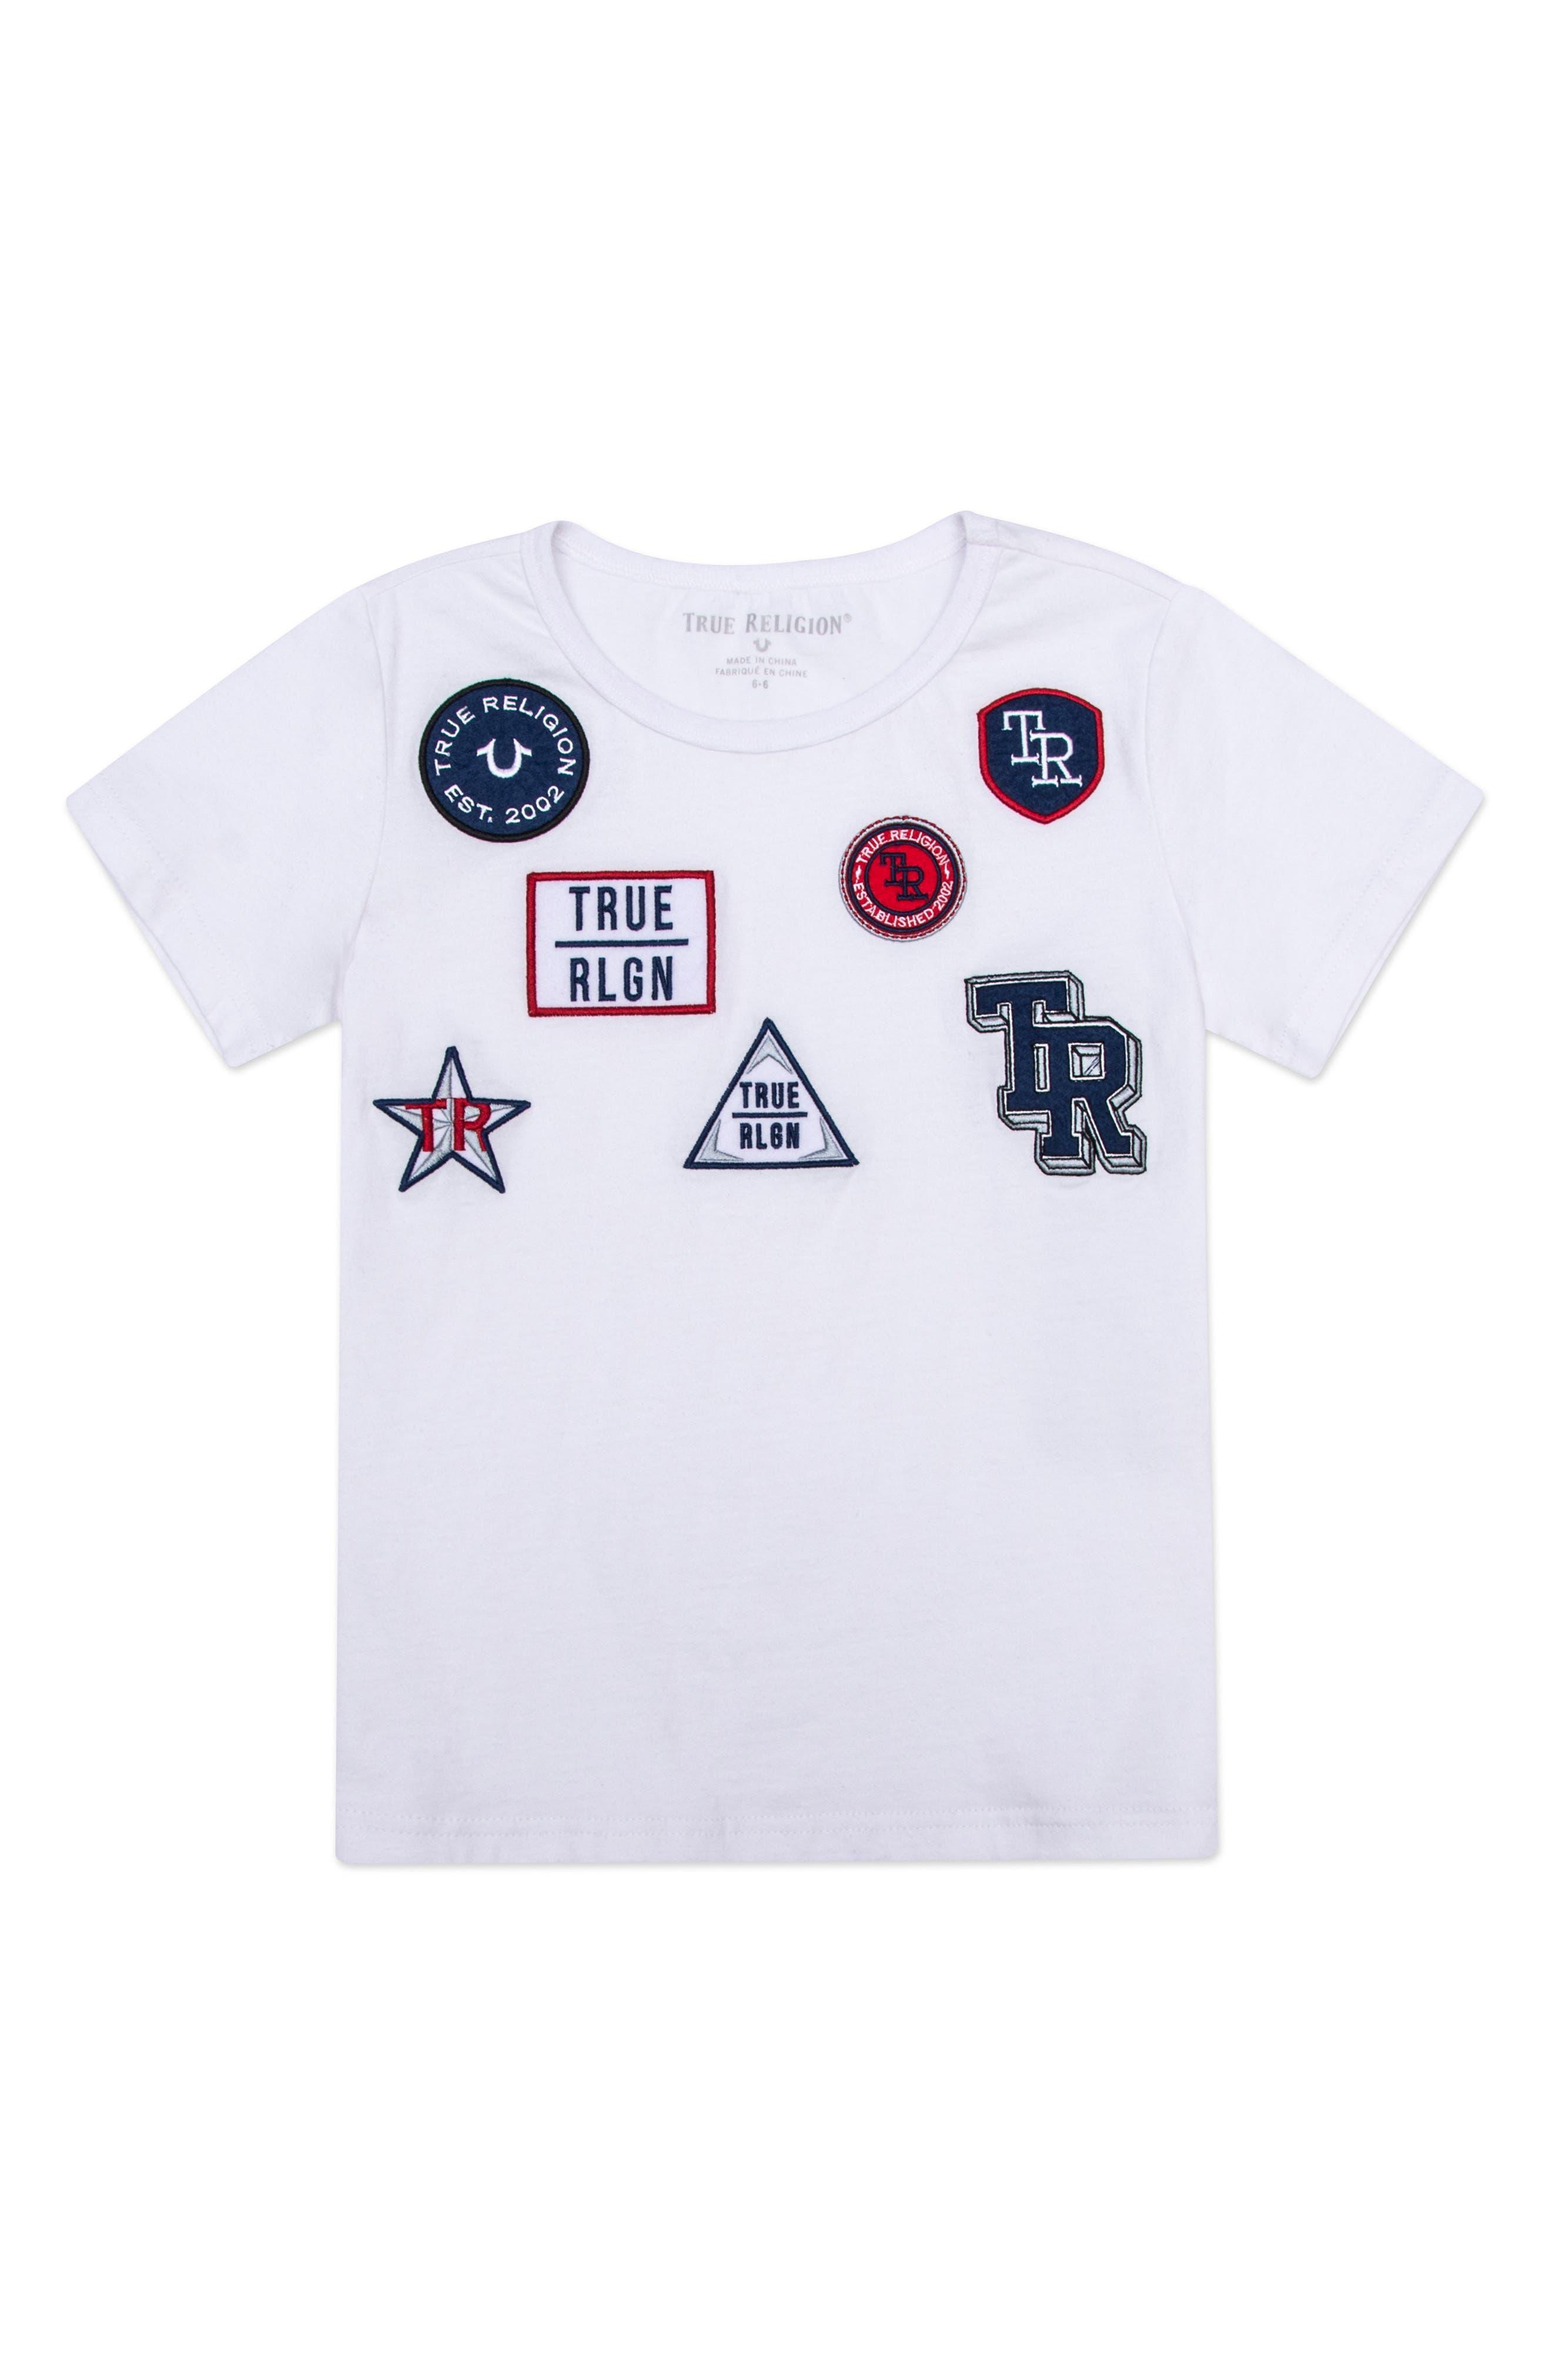 True Religion Brand Jeans Patch Rebel Appliqué T-Shirt (Toddler Boys & Little Boys)